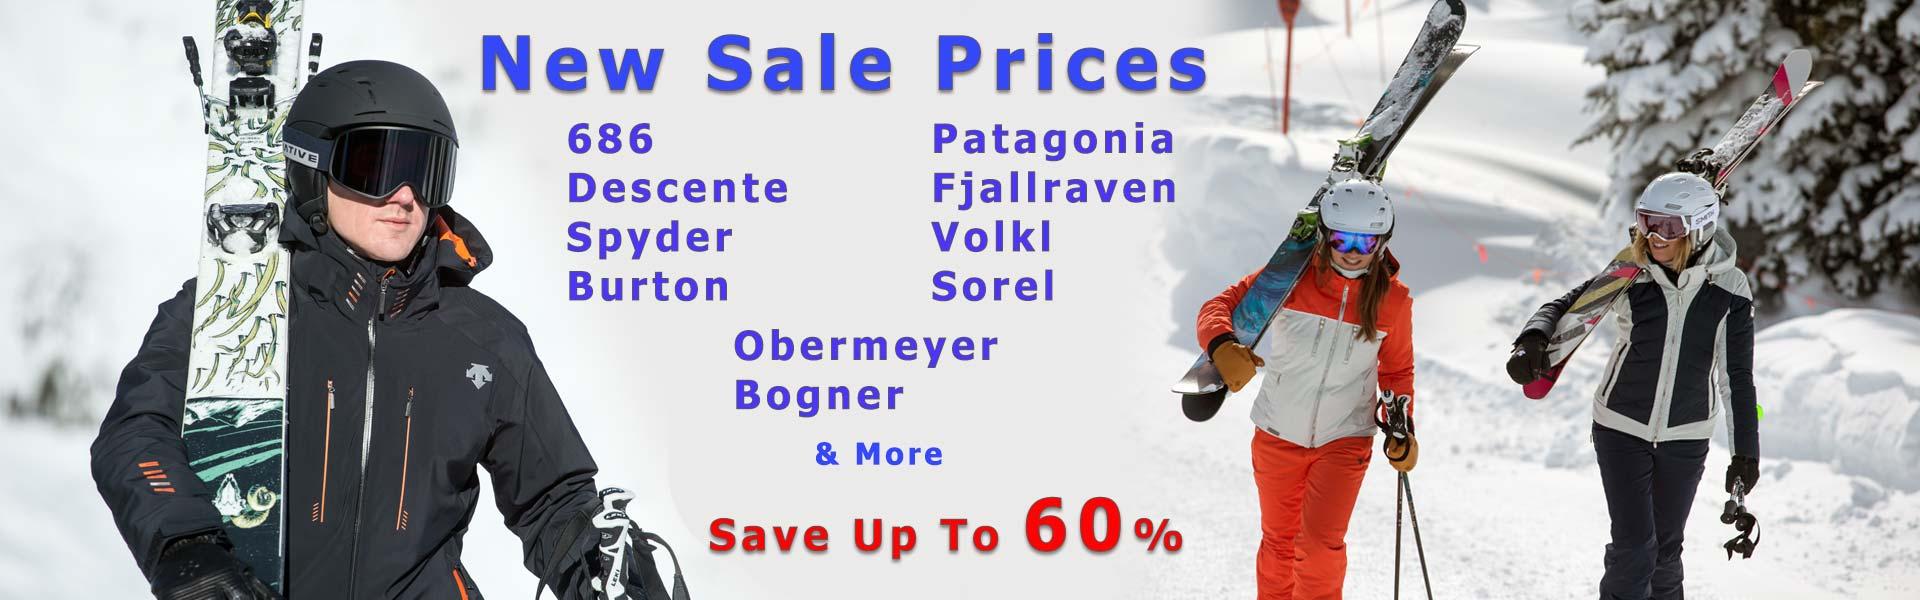 Best Selection of Ski Clothing & Equipment